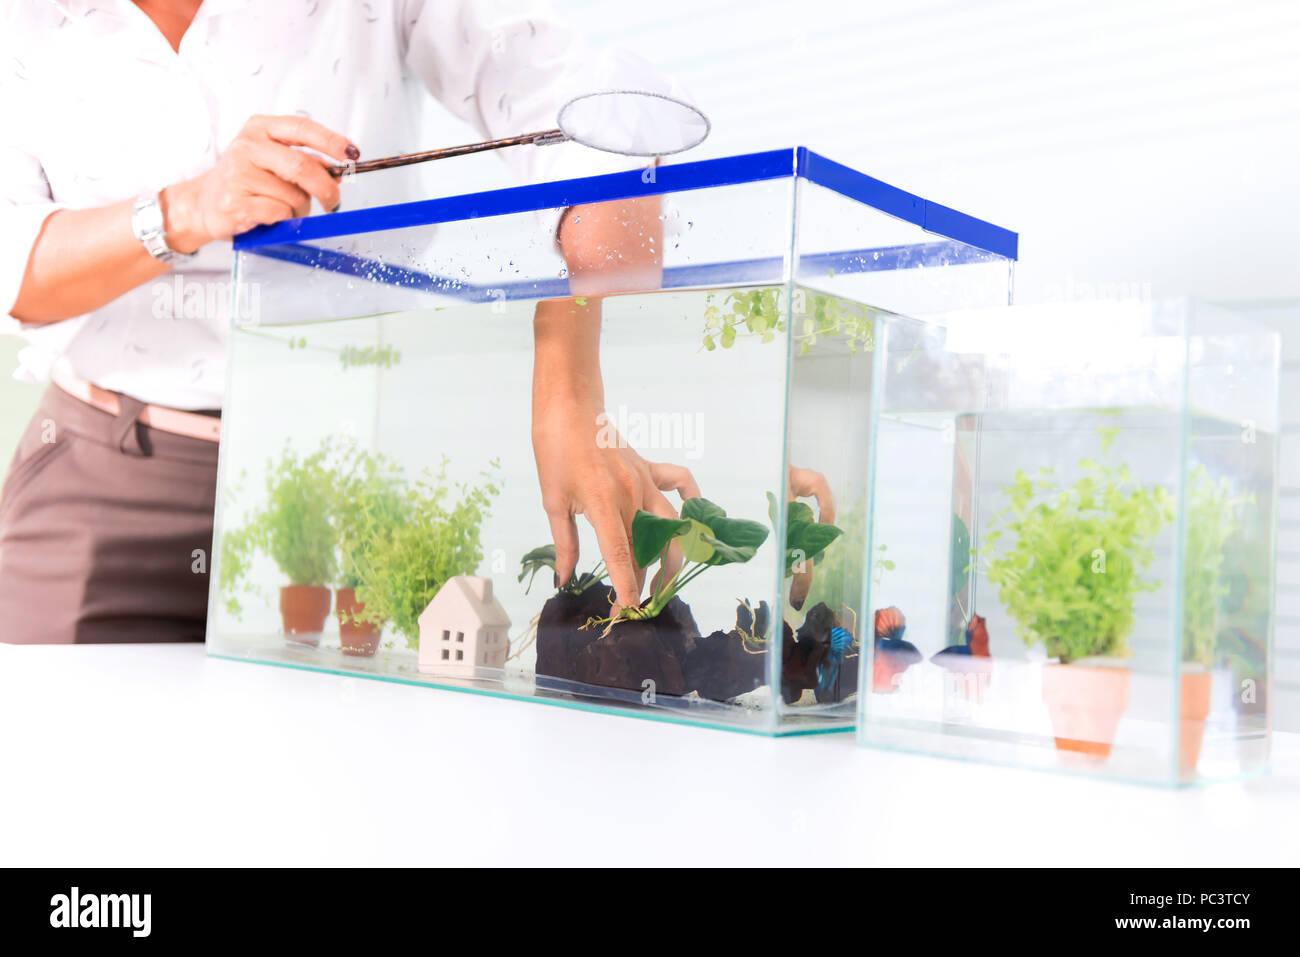 Fish Tank Home Stock Photos & Fish Tank Home Stock Images - Alamy